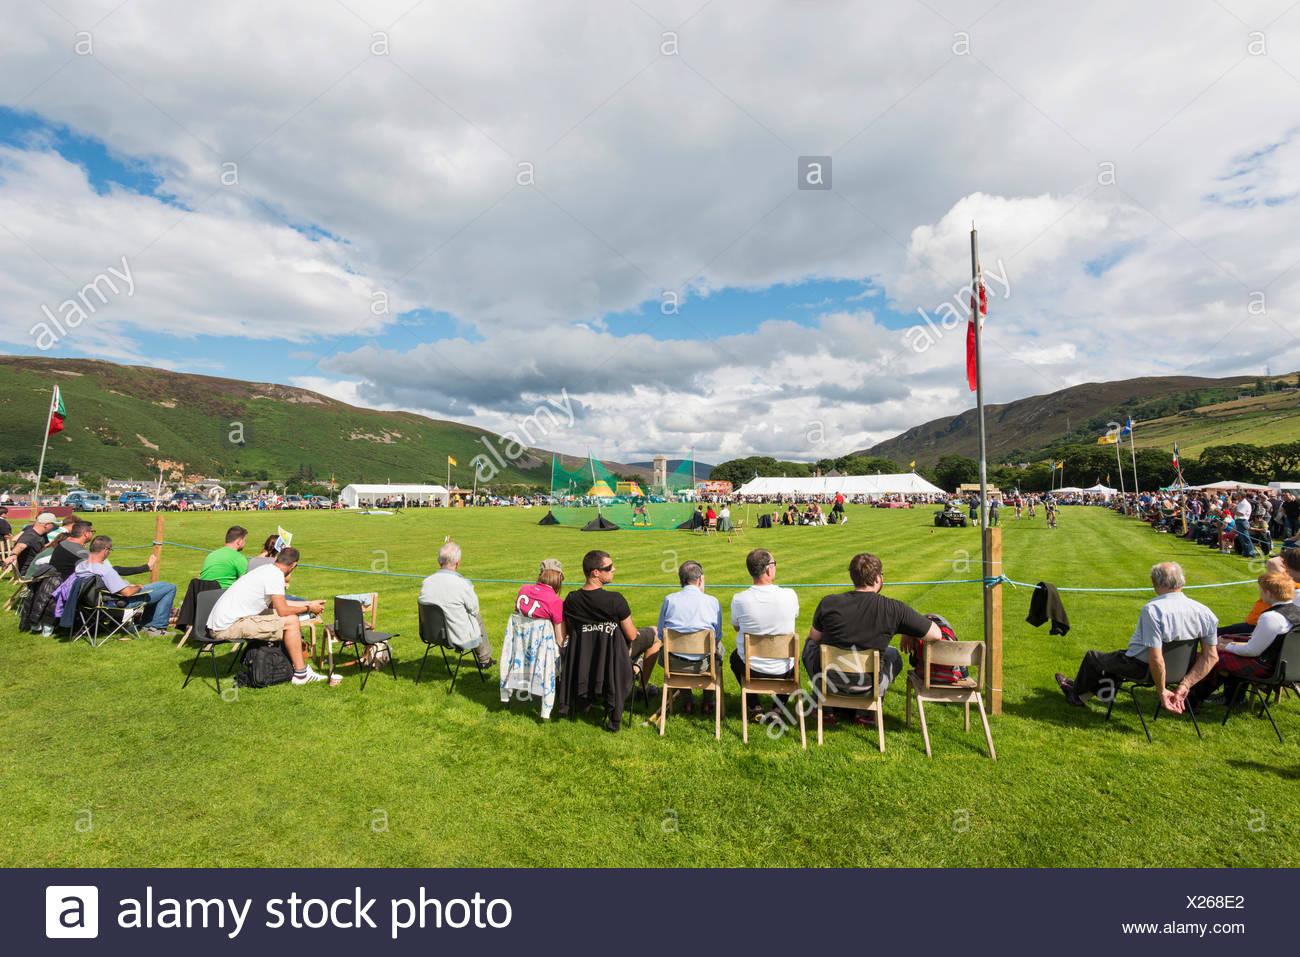 Spectators sitting on the sidelines, Helmsdale Highland Games, Helmsdale, Sutherland, Scotland, United Kingdom, Europe - Stock Image